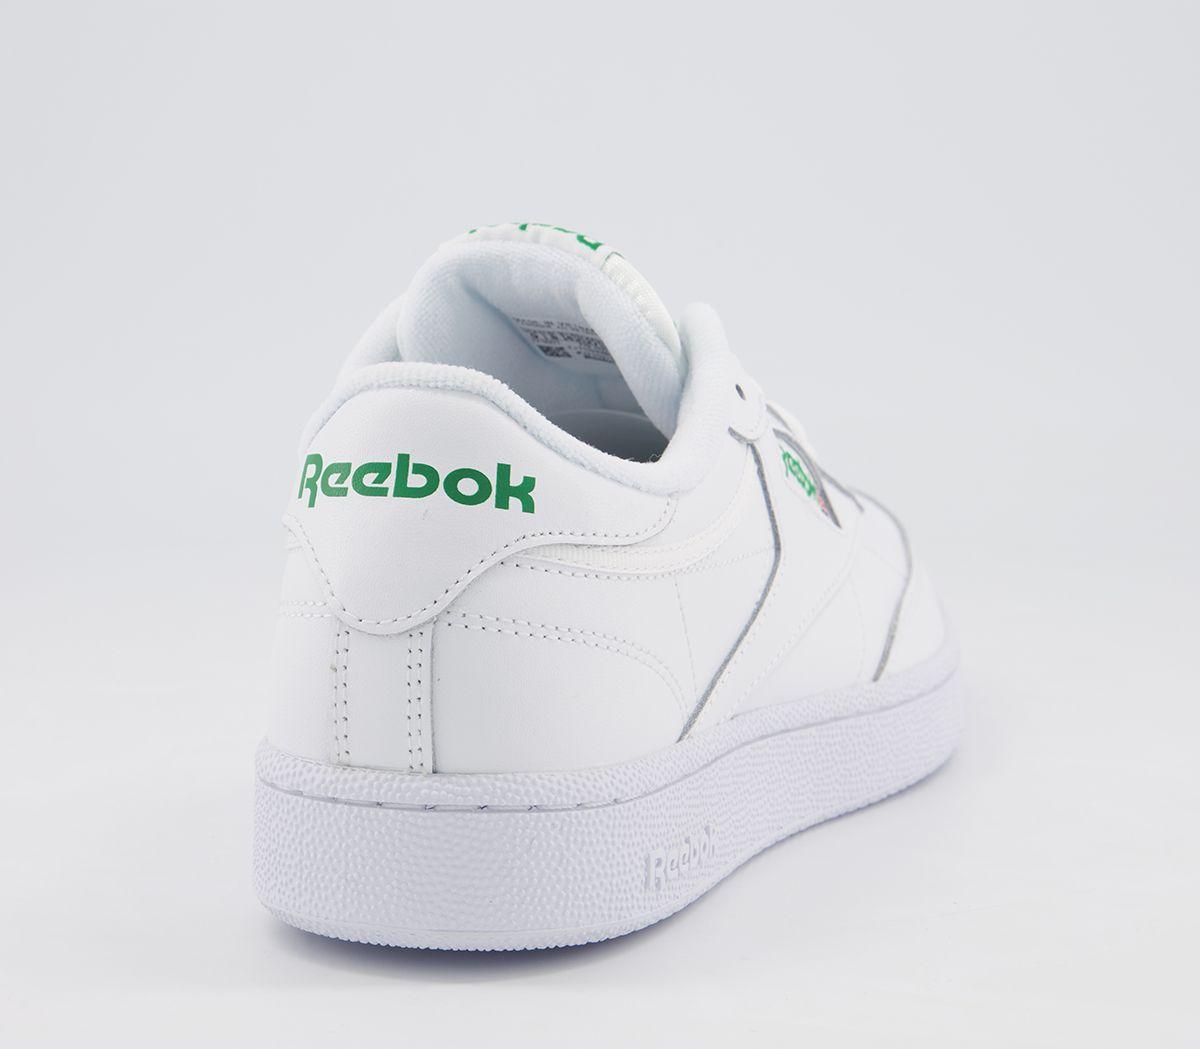 Reebok-Club-85-Bianco-Verde-C-Sneakers miniatura 9